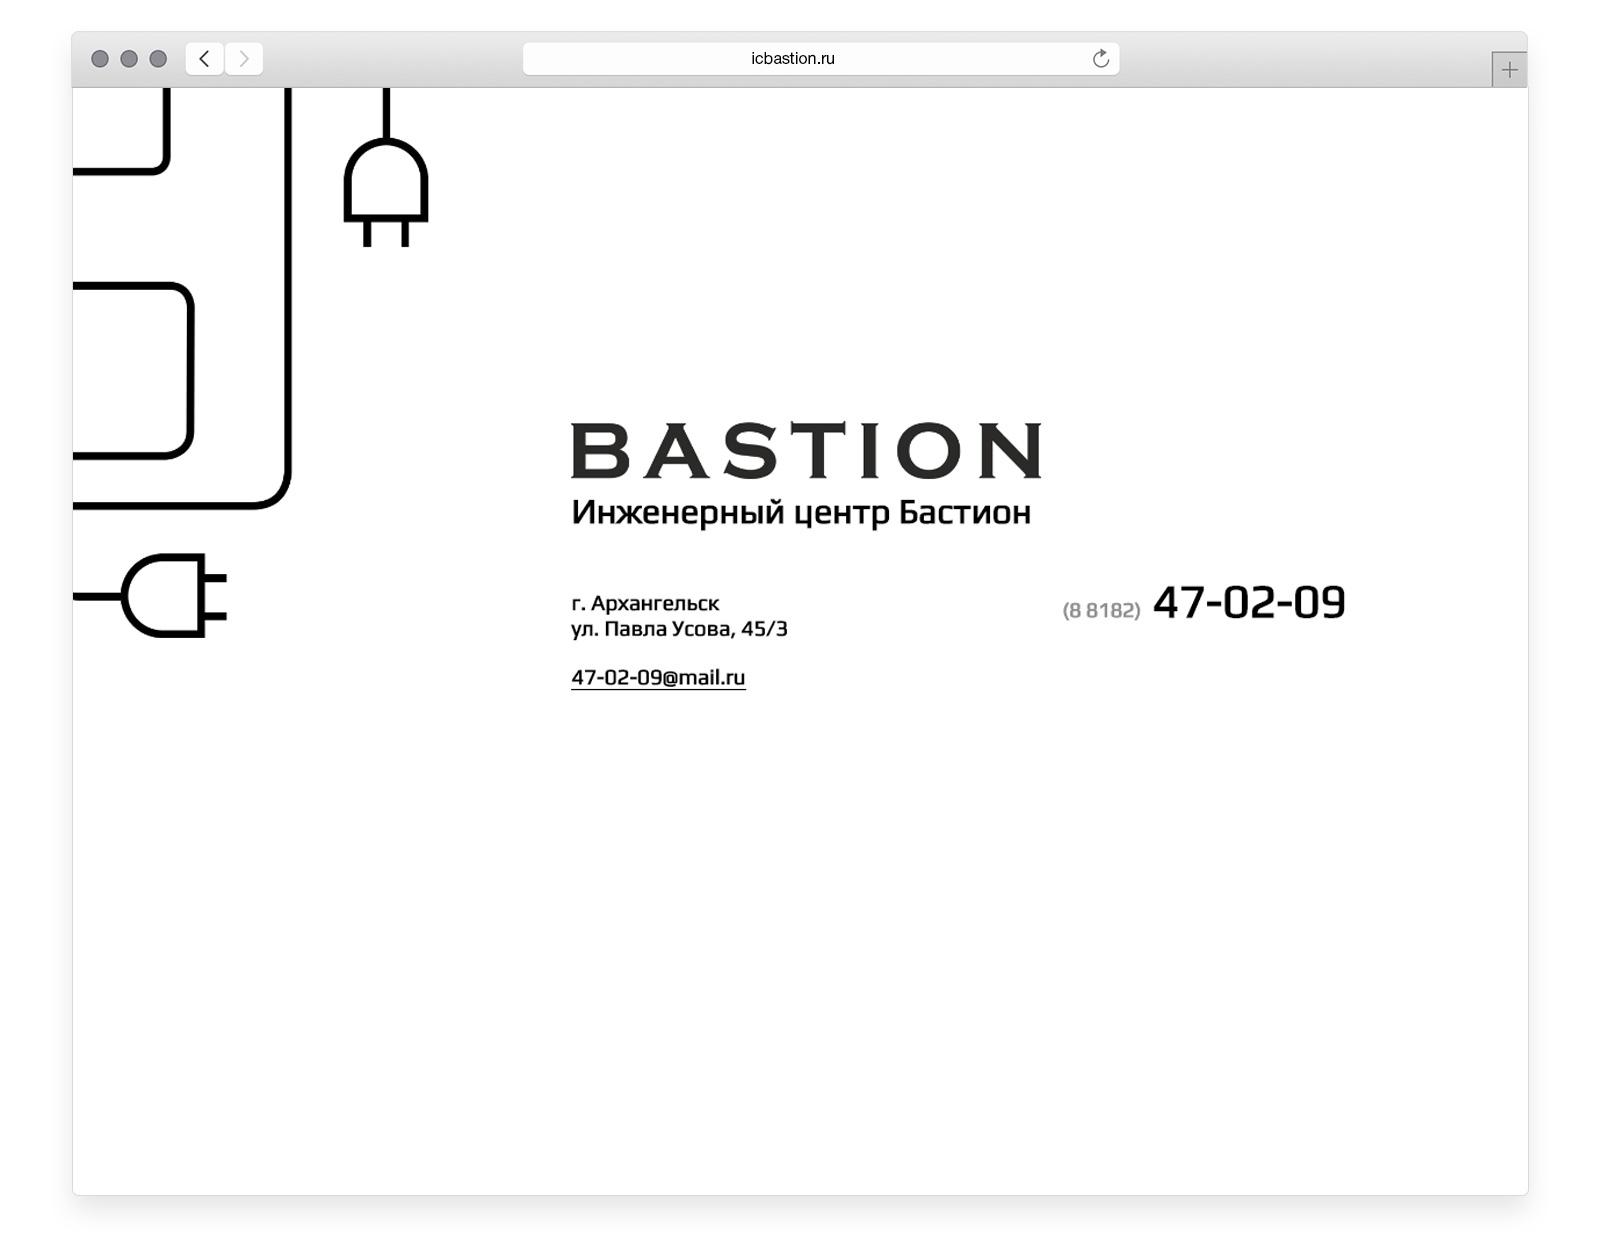 Сайт инженерного центра Бастион